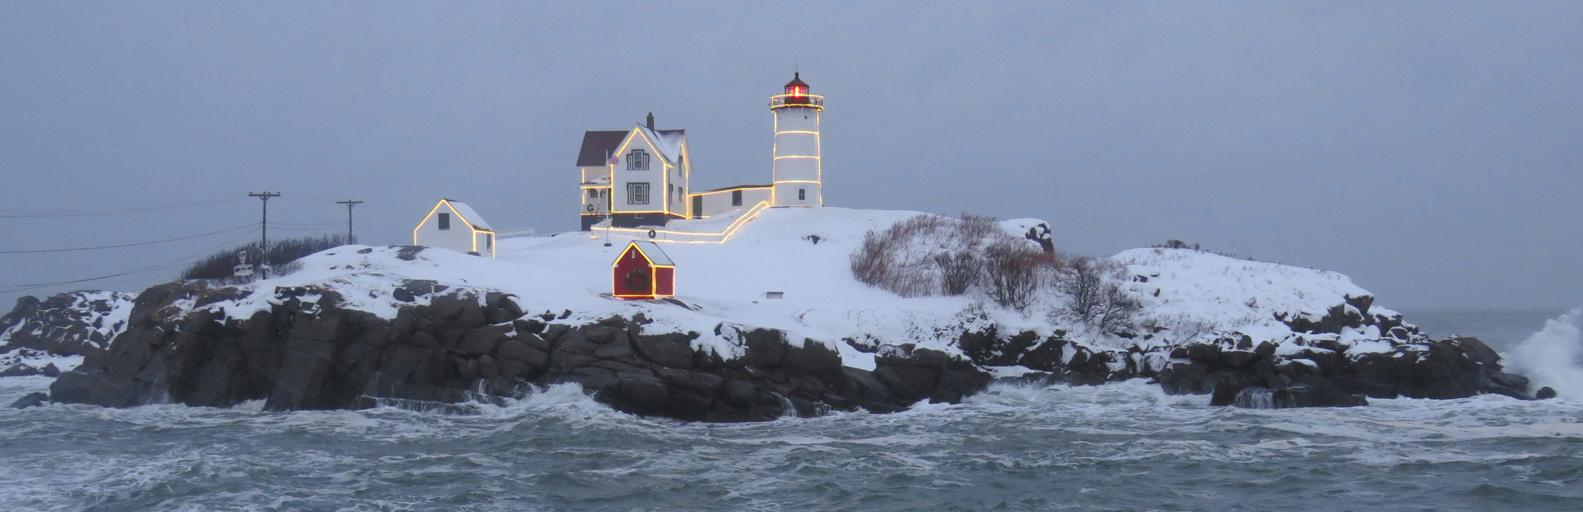 Nubble Light…Like no other Lighthouse at Christmastime